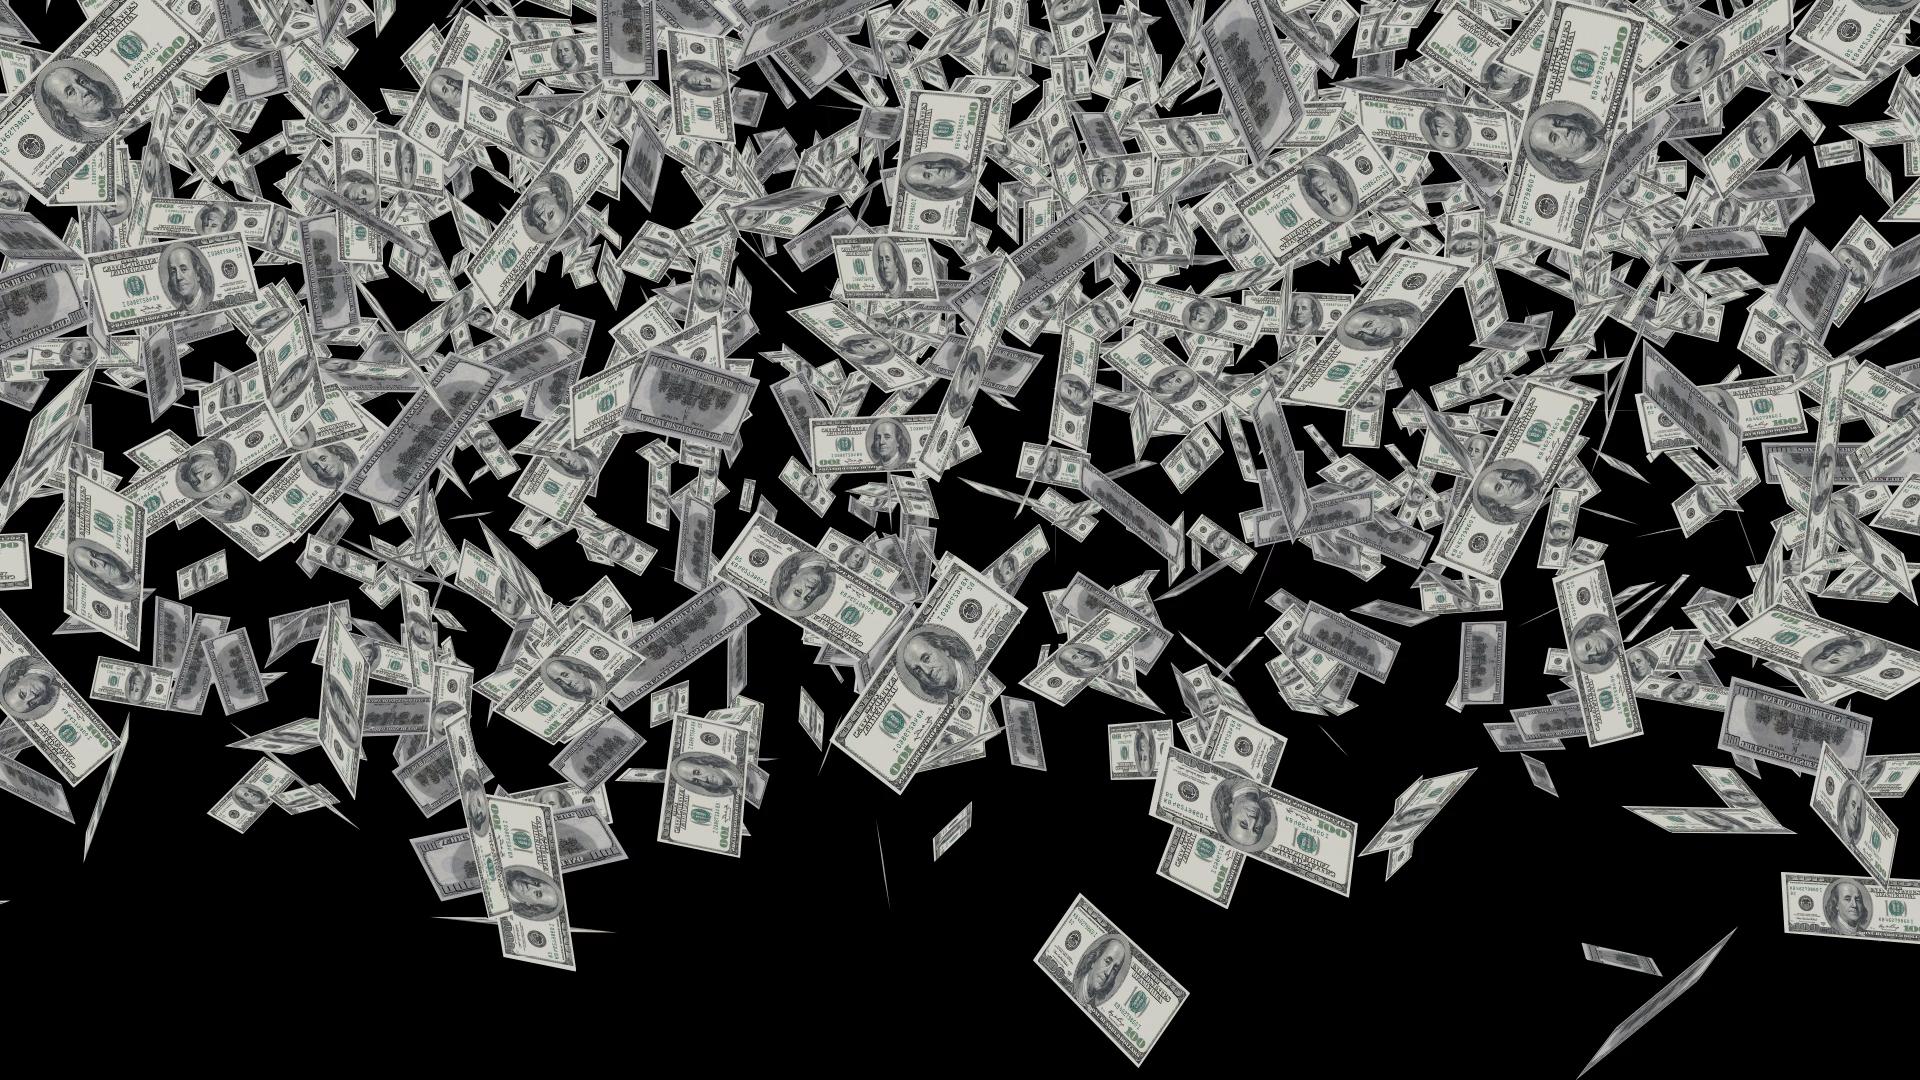 Billion Dollars Bitcoin Rain Lls Dollars Usa Flying Flying Money Free Videos Royalty Free Footages Free Backgro American Dollar Free Stock Footage Dollar Usa